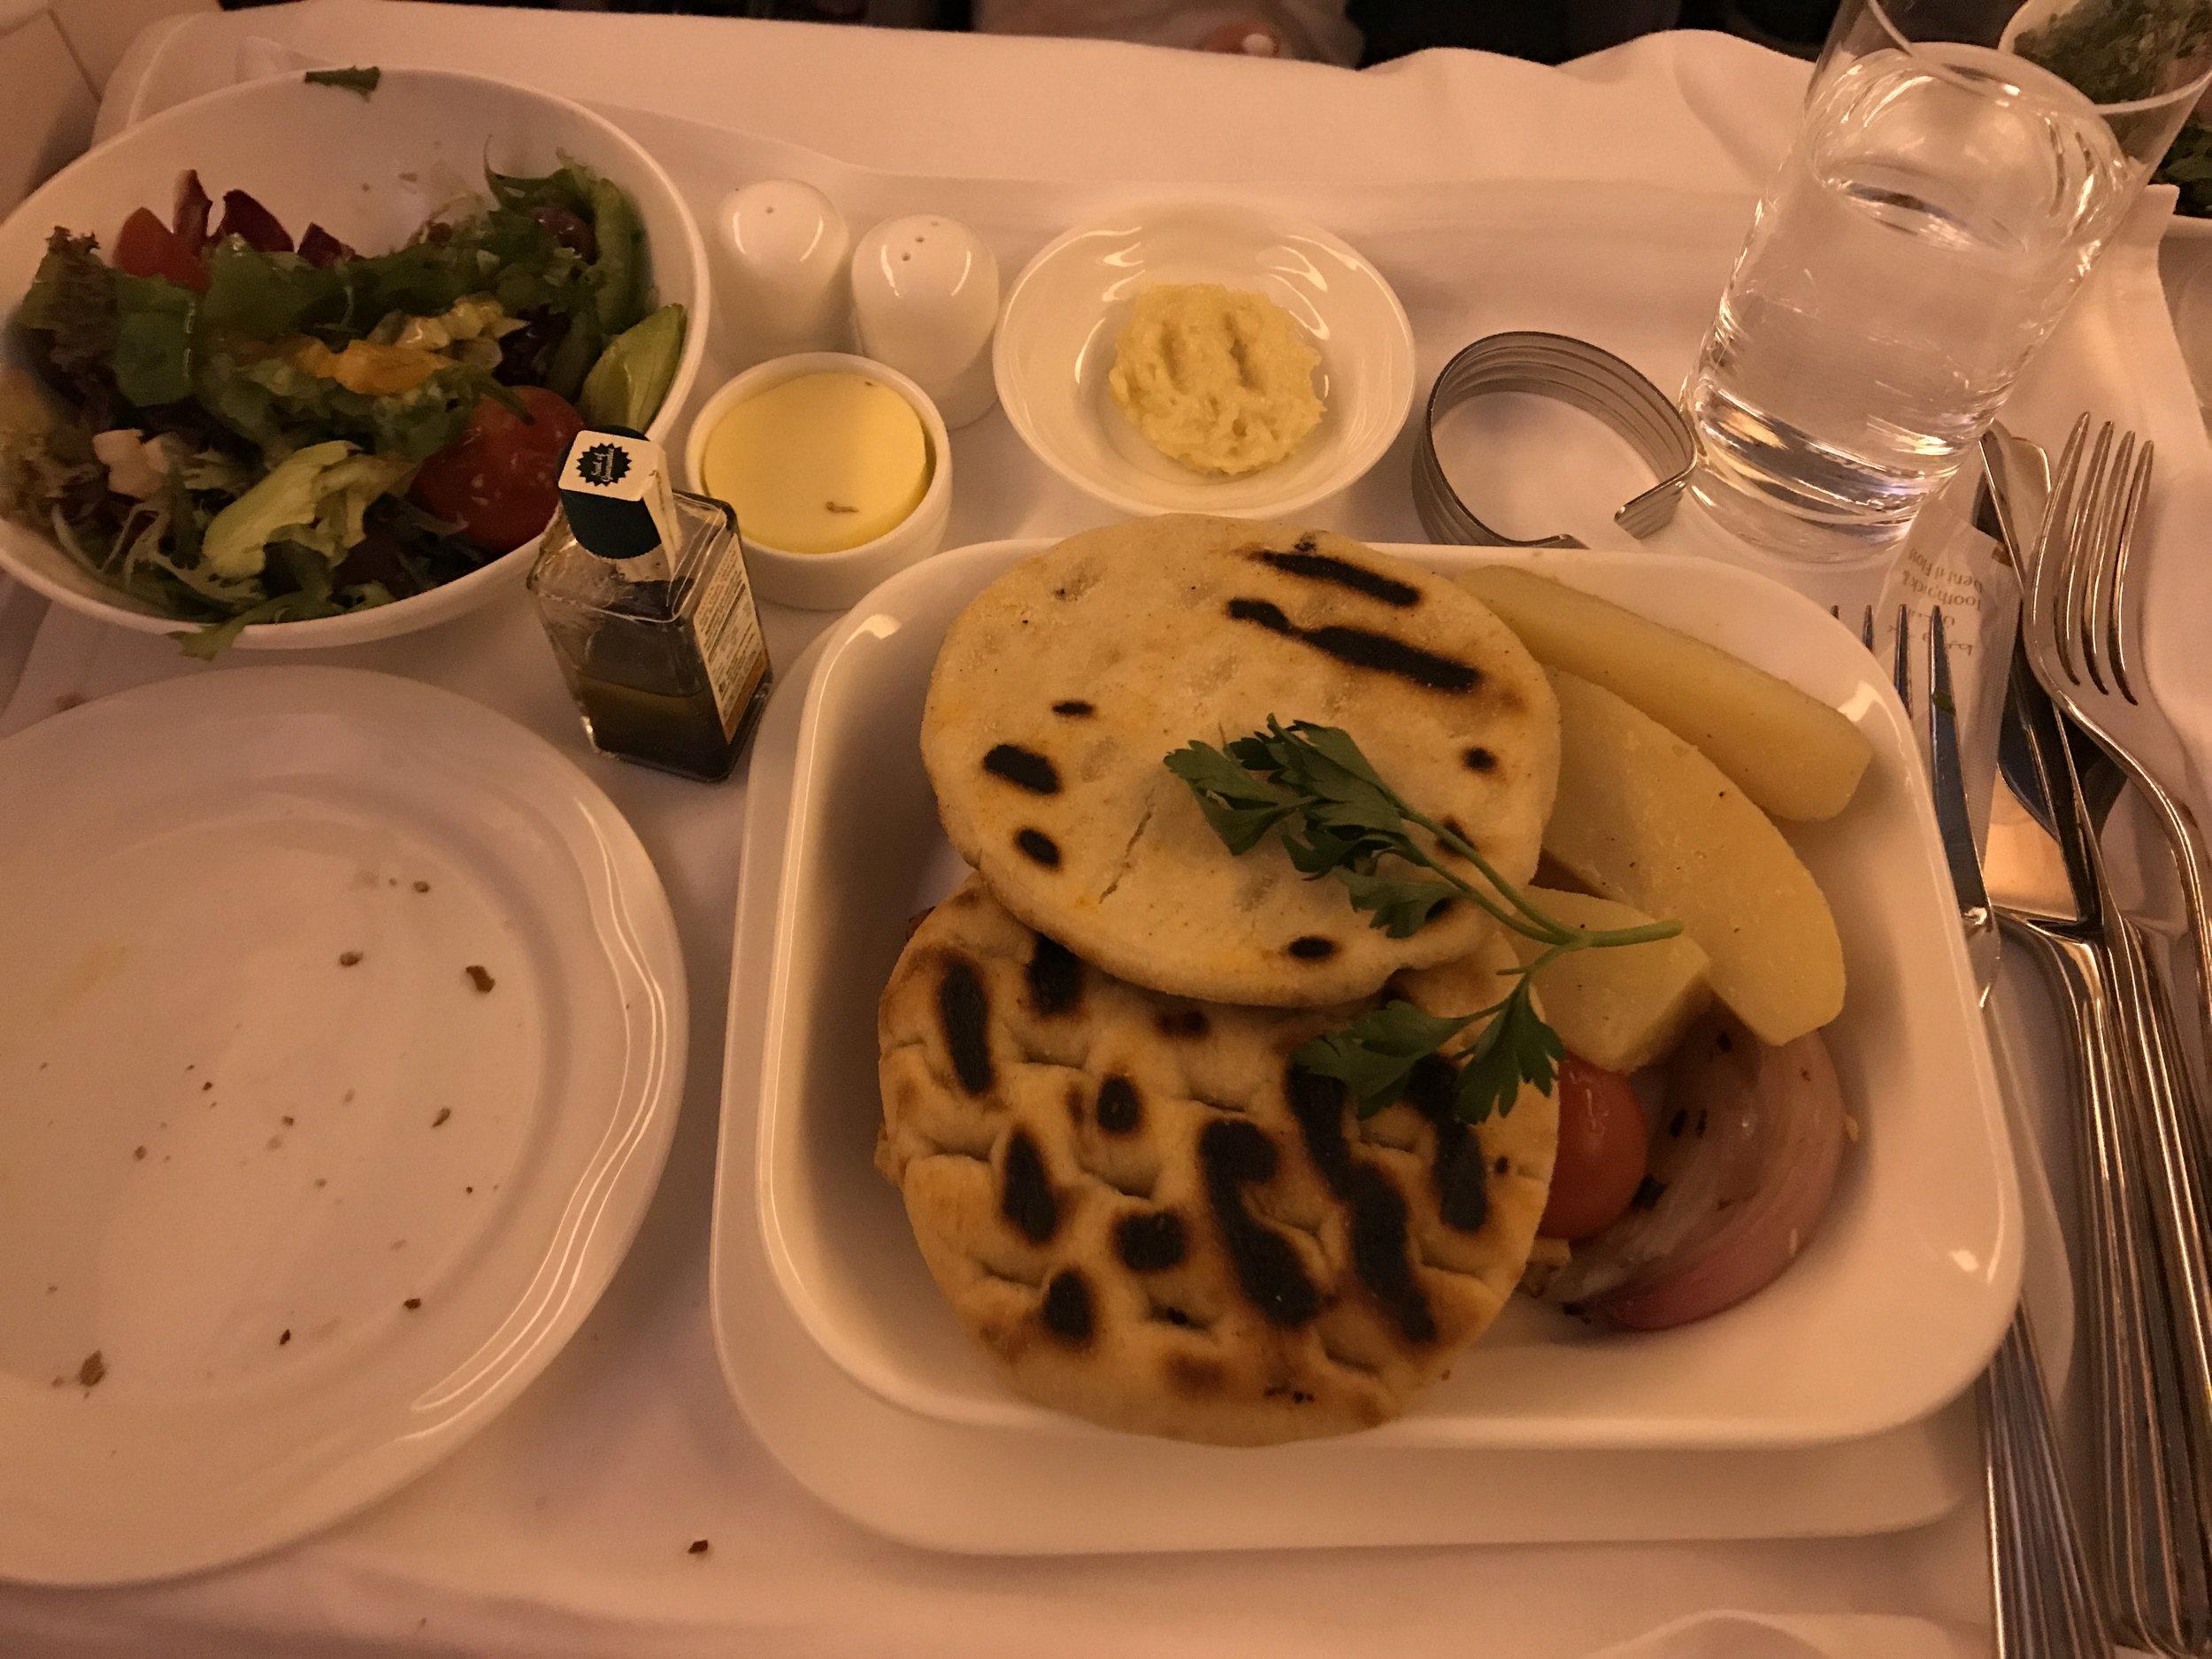 Arabic Grilled Meat Platter